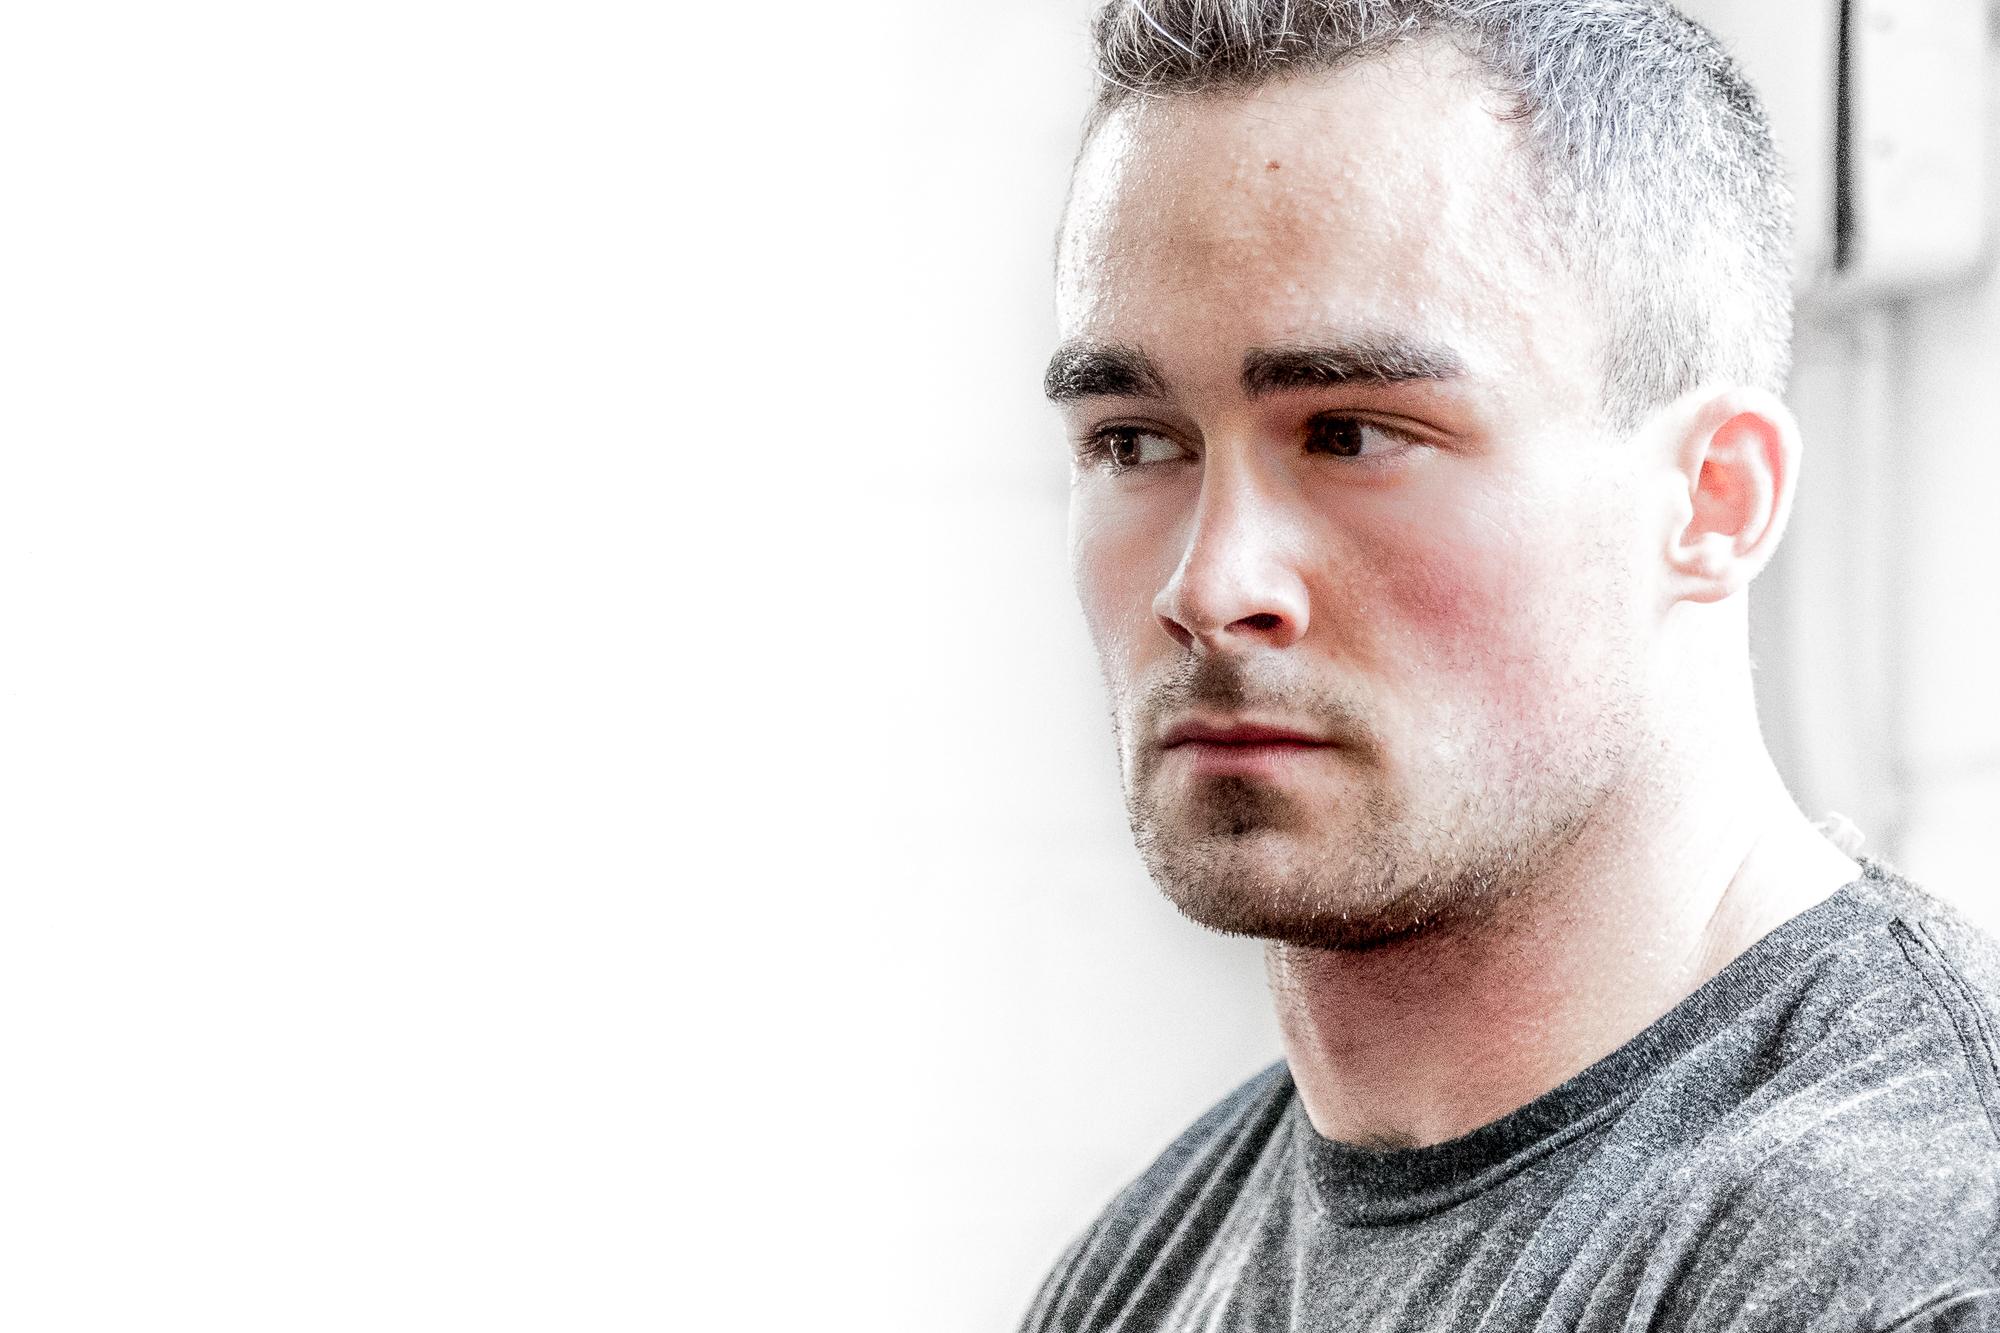 august-nywa-training-weightlifting-photos-by-everyday-lifters-viviana-podhaiski-7.jpg